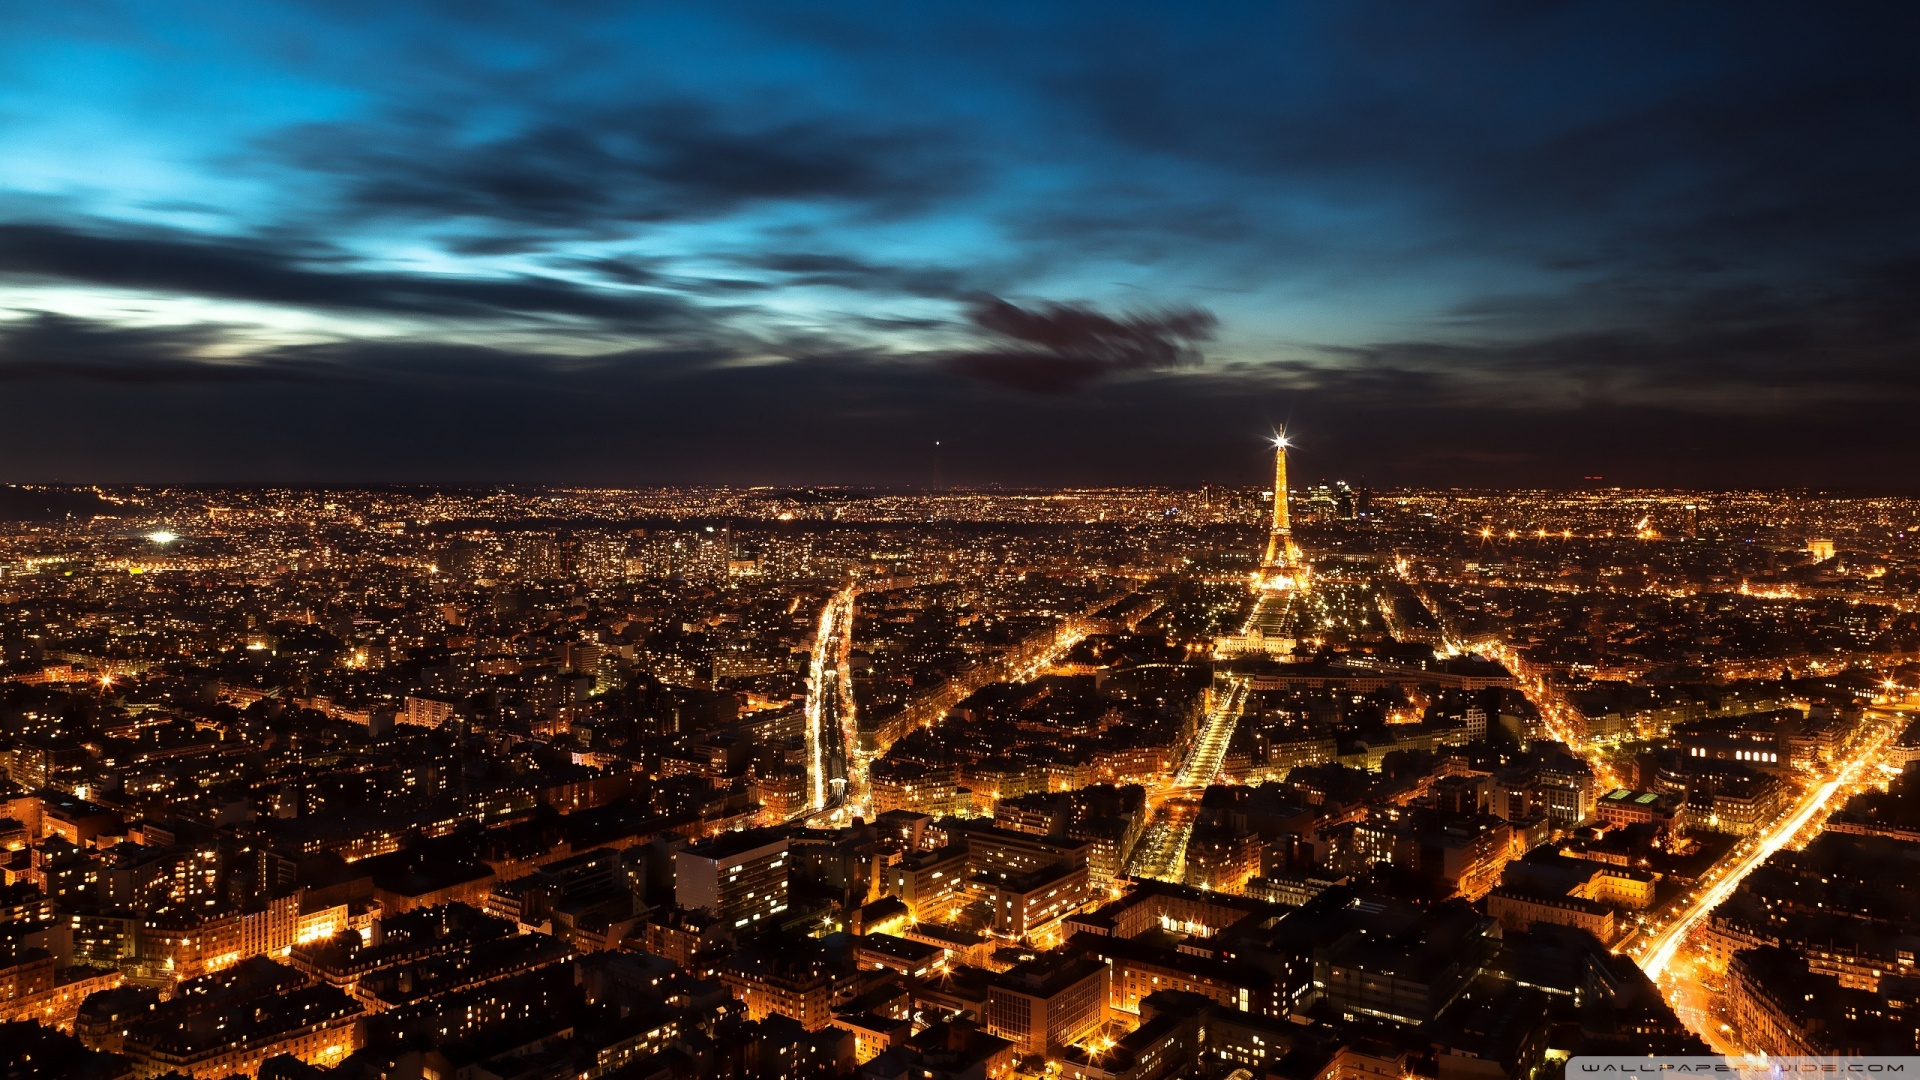 HD City Lights